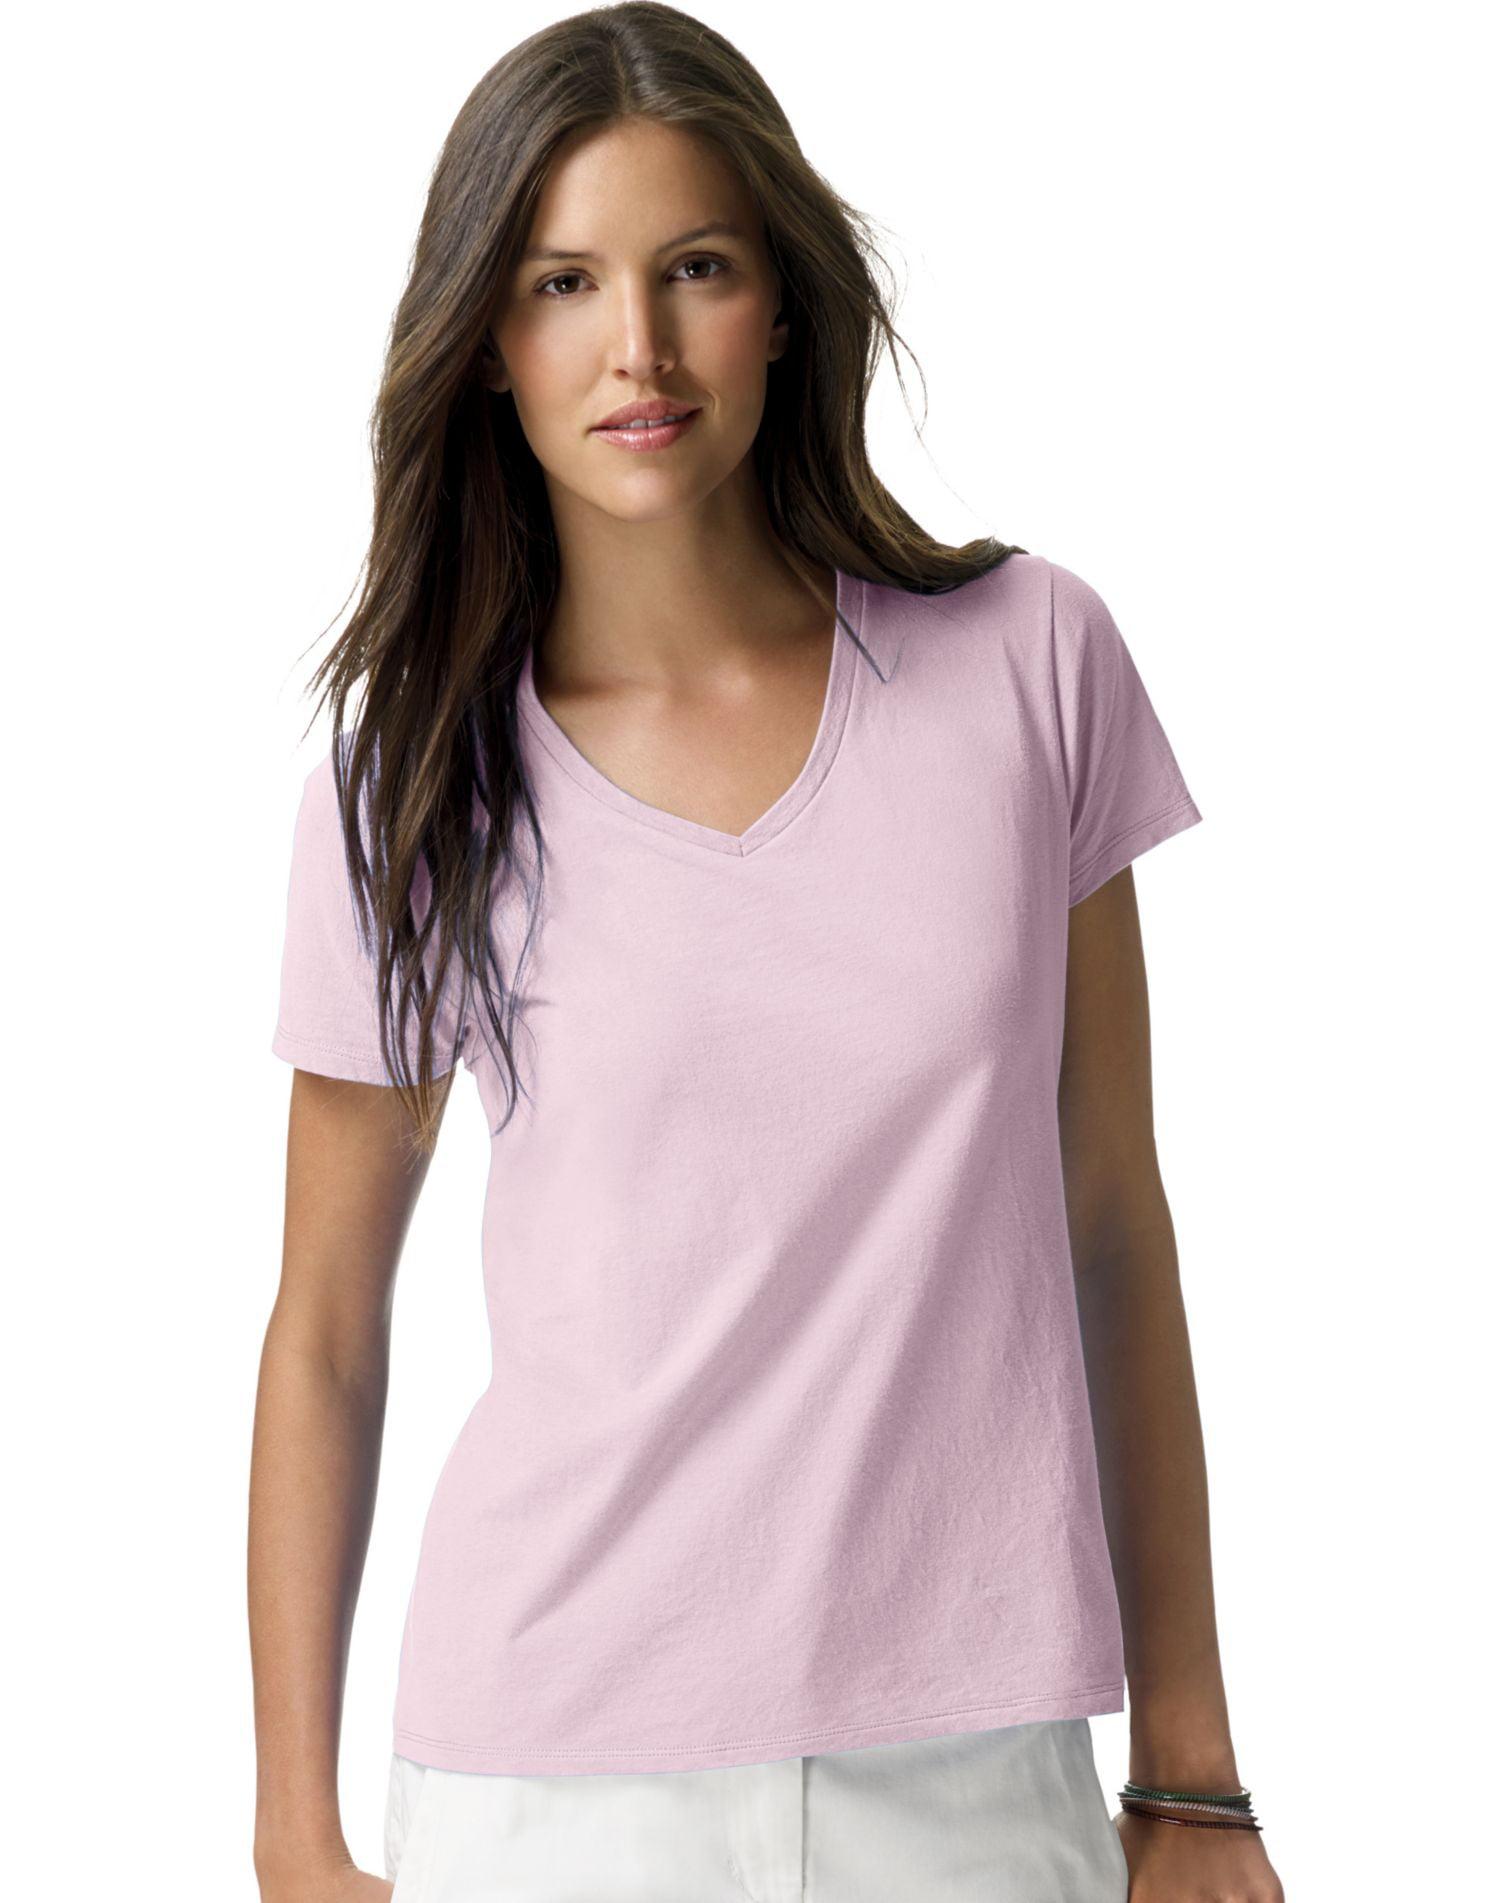 4-Pack XXL 5780 Hanes ComfortSoft V-Neck T-Shirt Ash 2XL